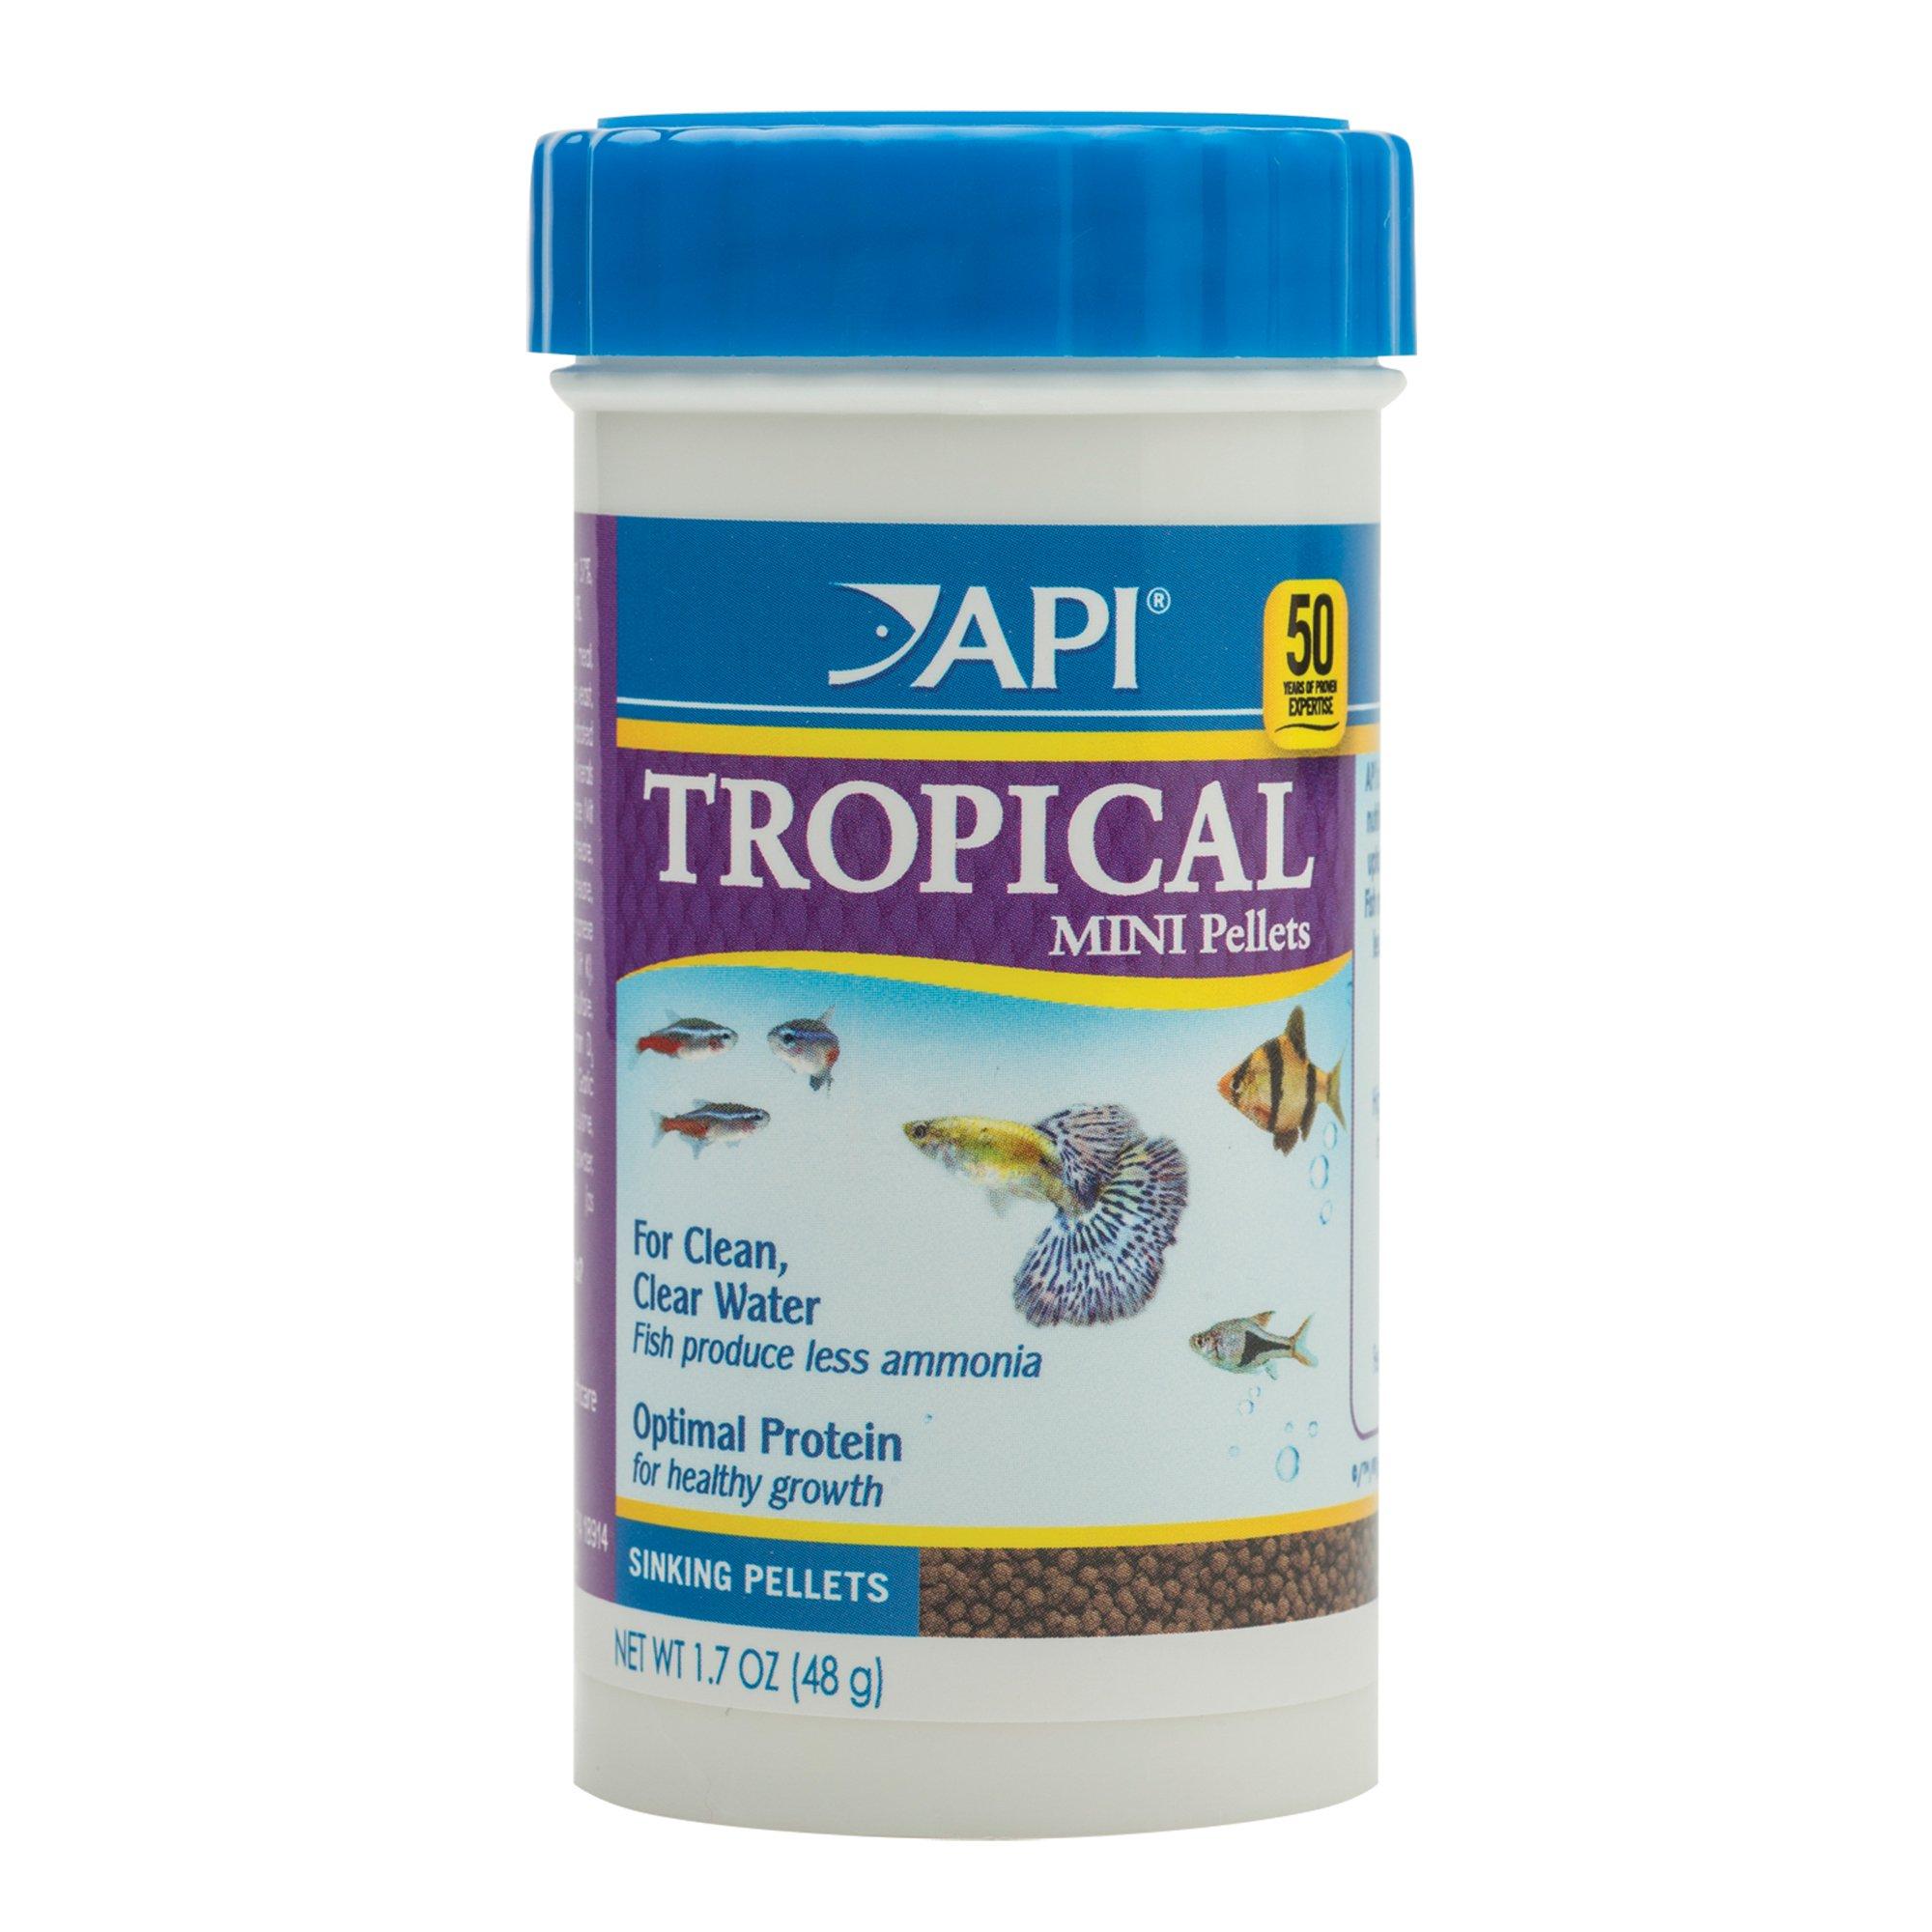 Api tropical mini pellets mini sinking pellets fish food for Petco fish food